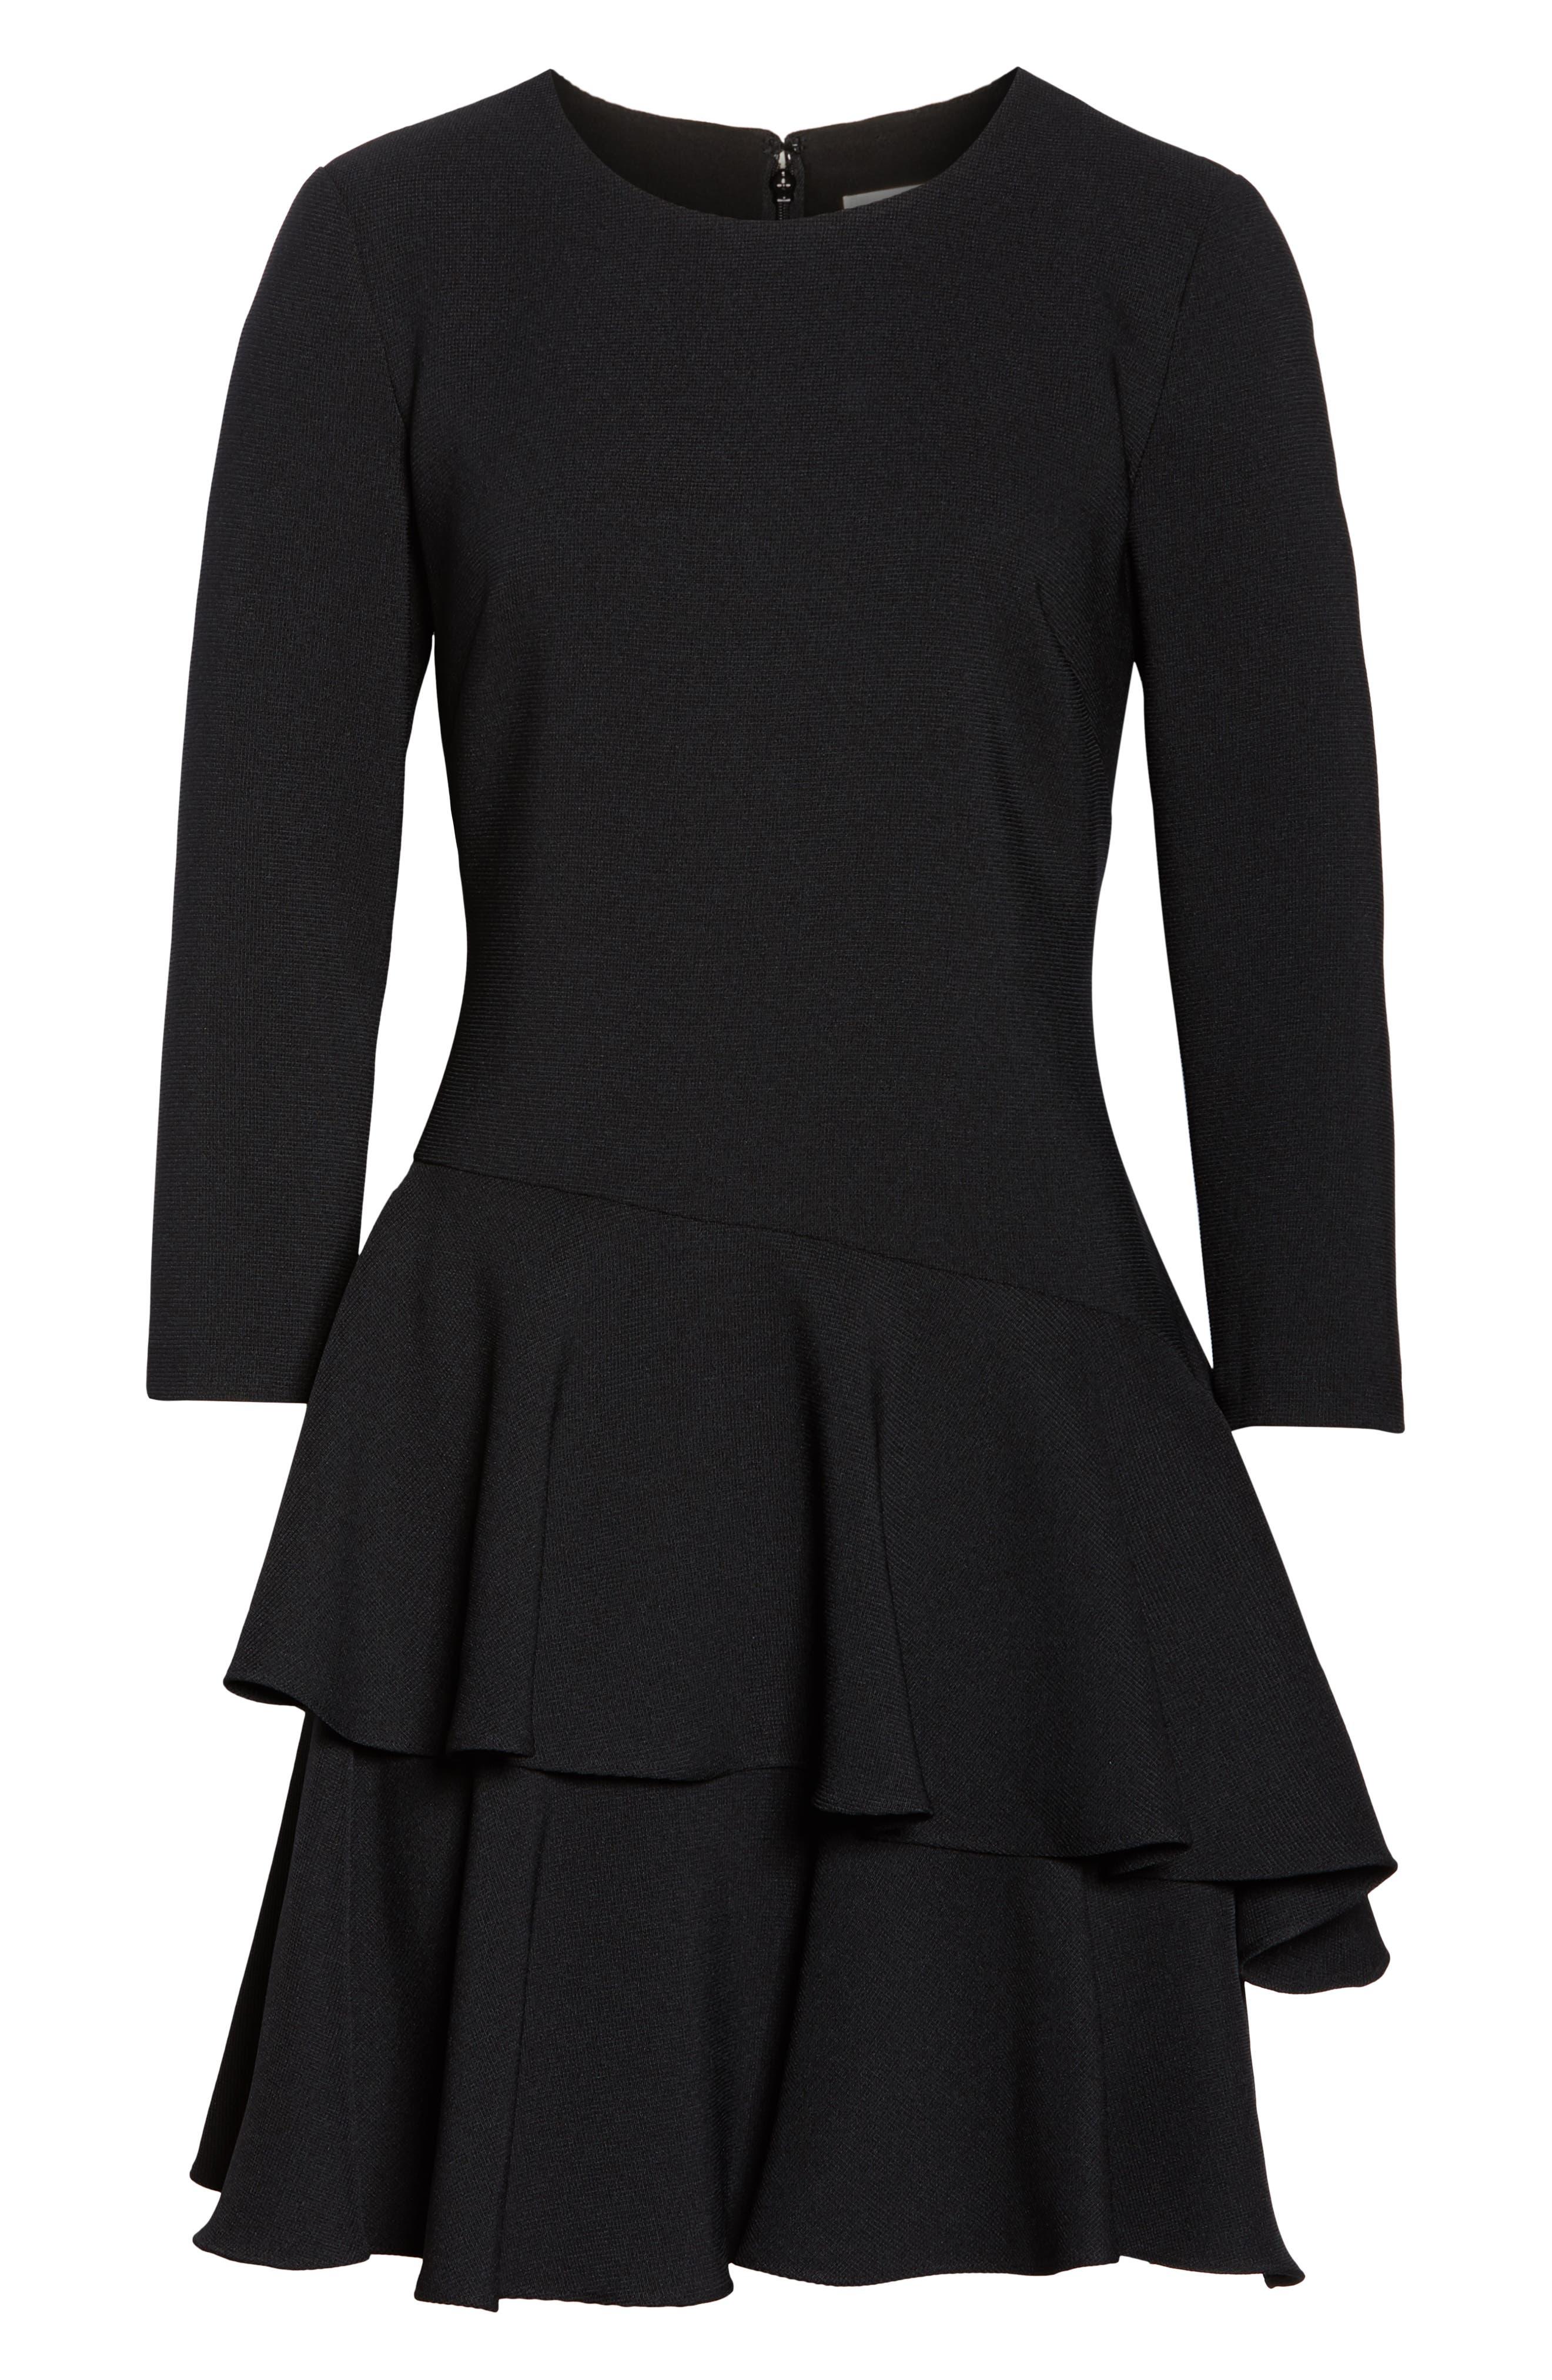 ELIZA J, Tiered Ruffle Knit Dress, Alternate thumbnail 7, color, 001